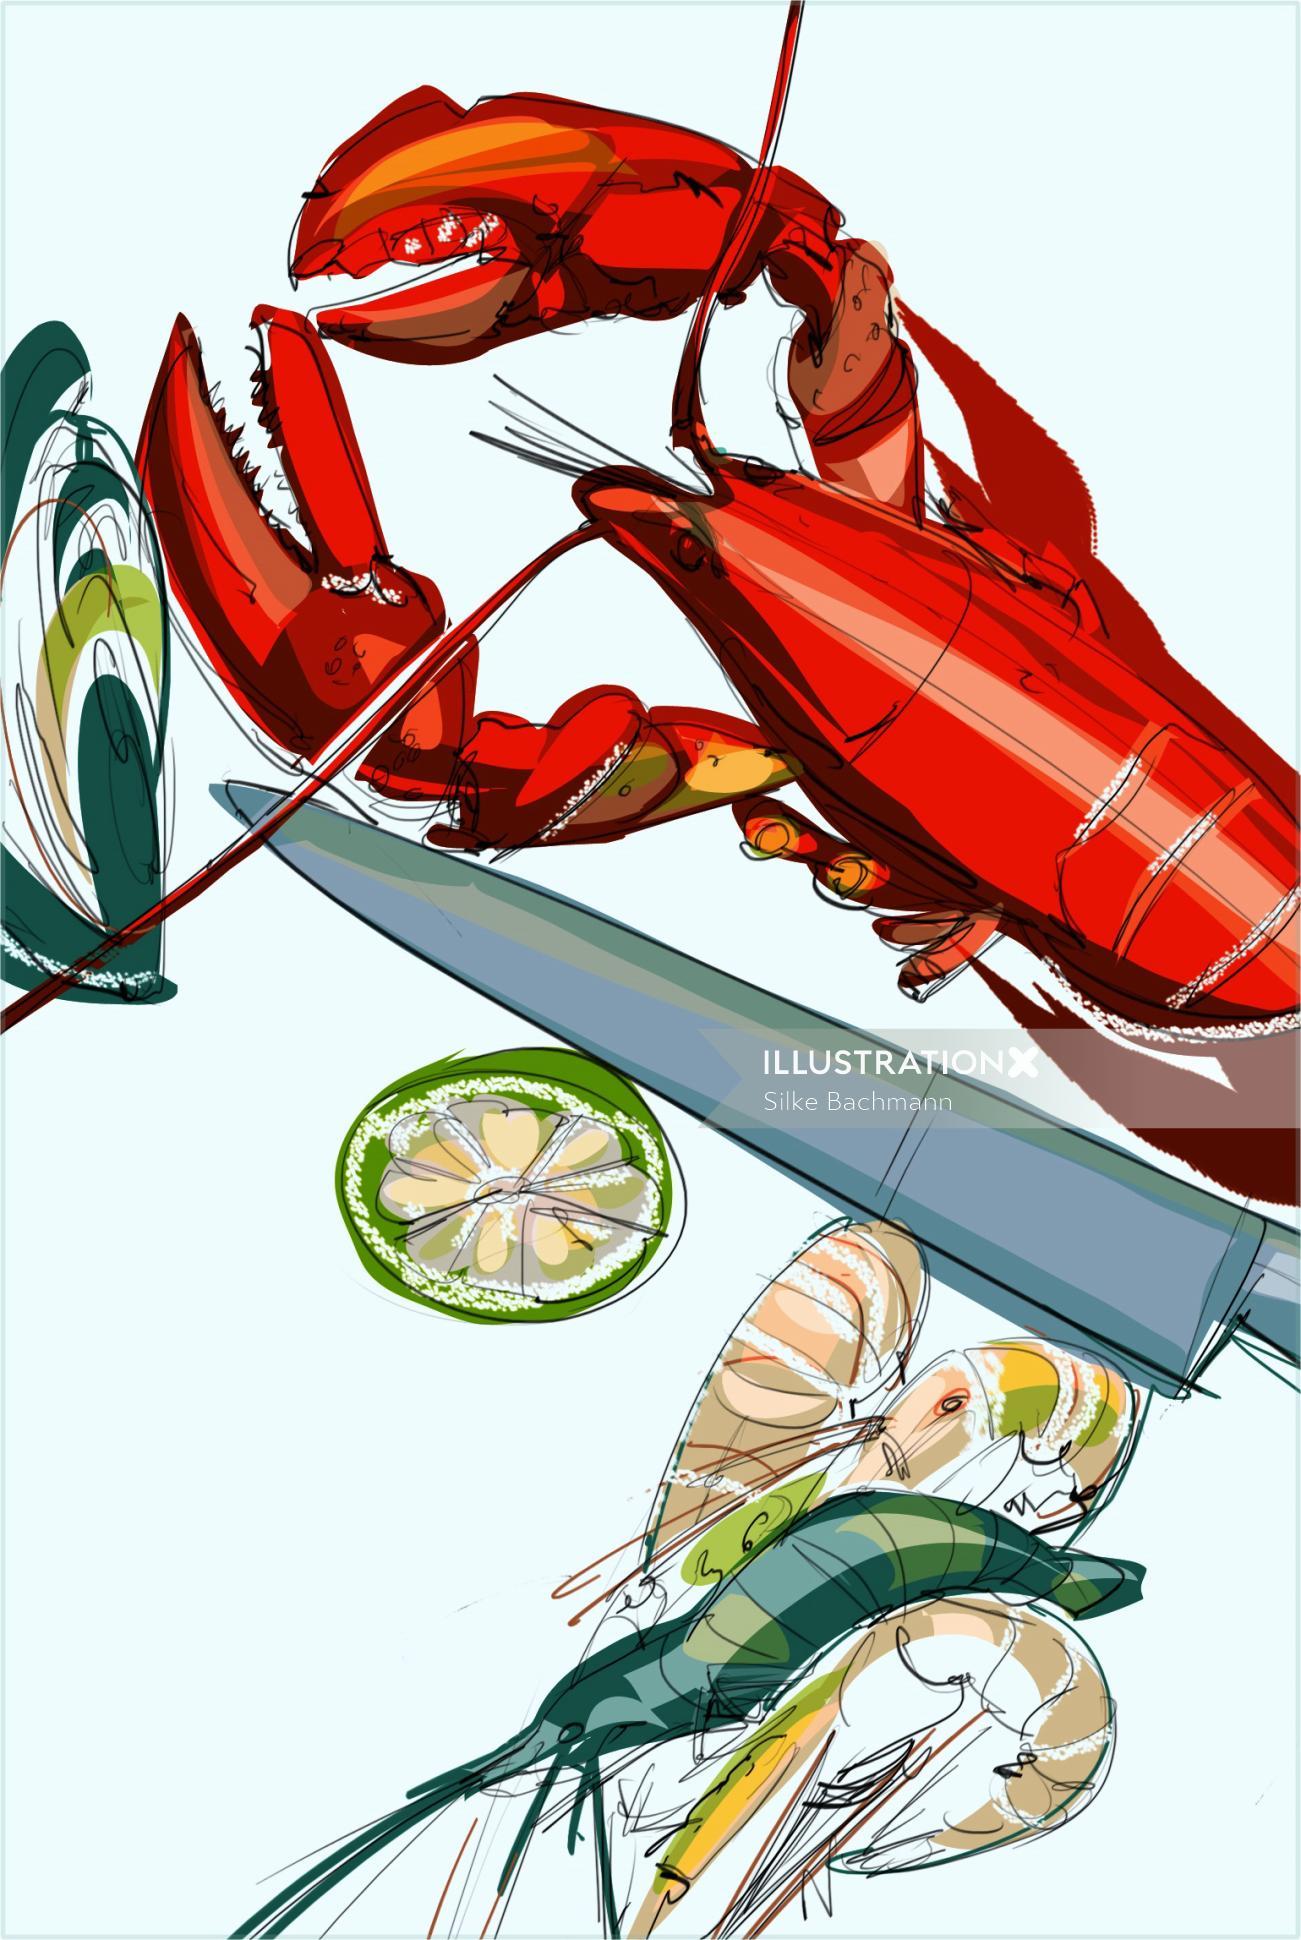 Food & Drink illustration of Crab